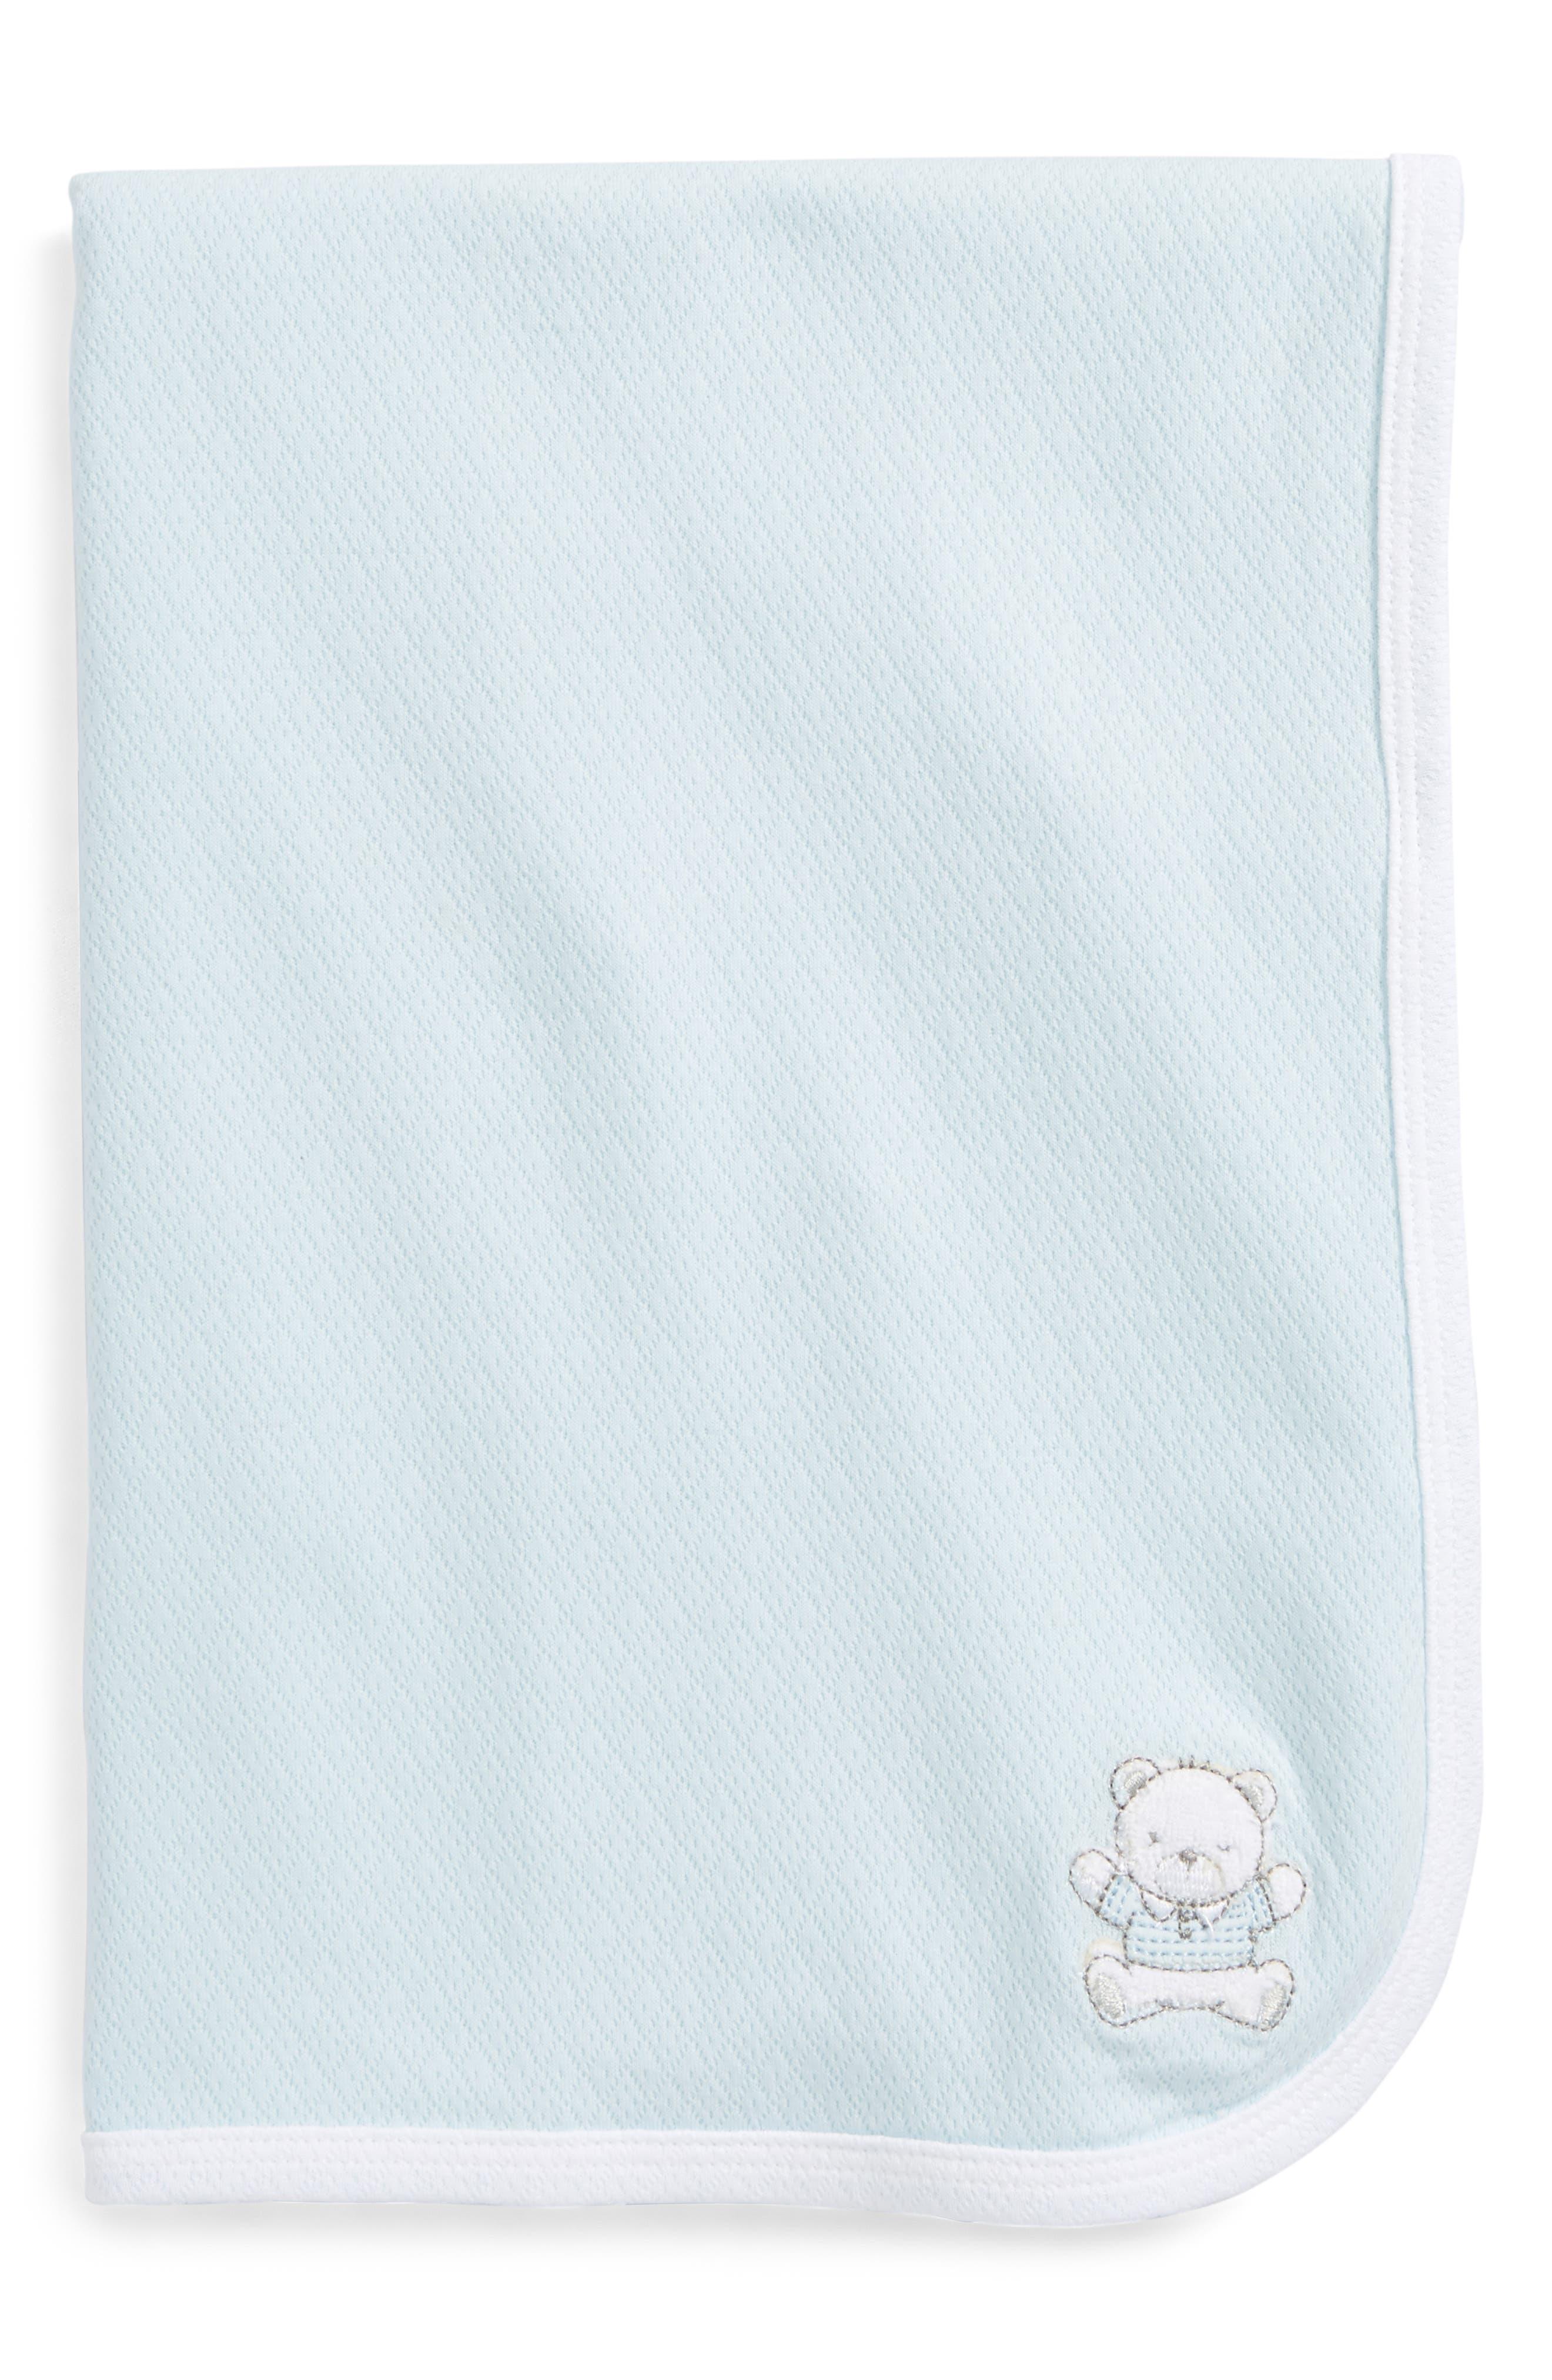 Main Image - Little Me Bear Receiving Blanket (Baby) (Nordstrom Exclusive)